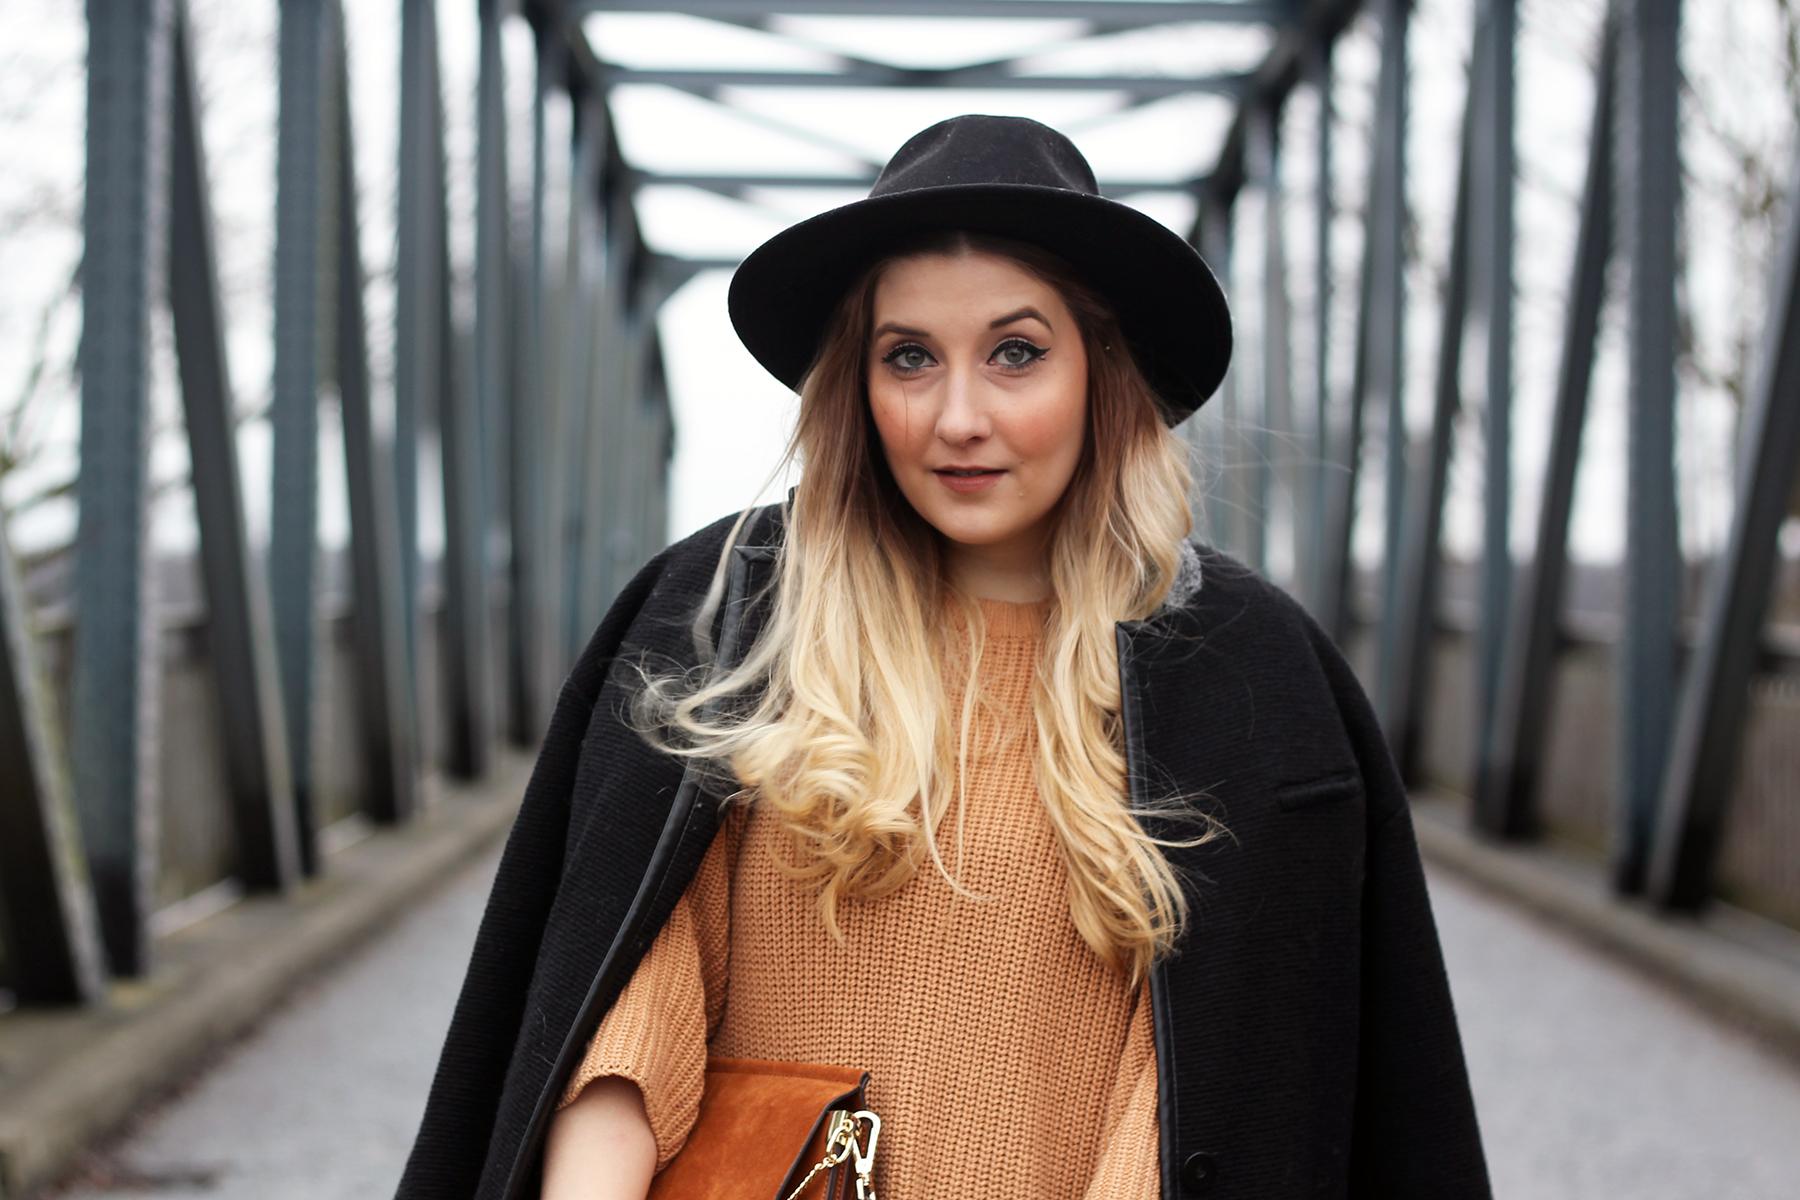 outfit-look-style-modeblog-fashionblog-edited-lederhose-deutschland